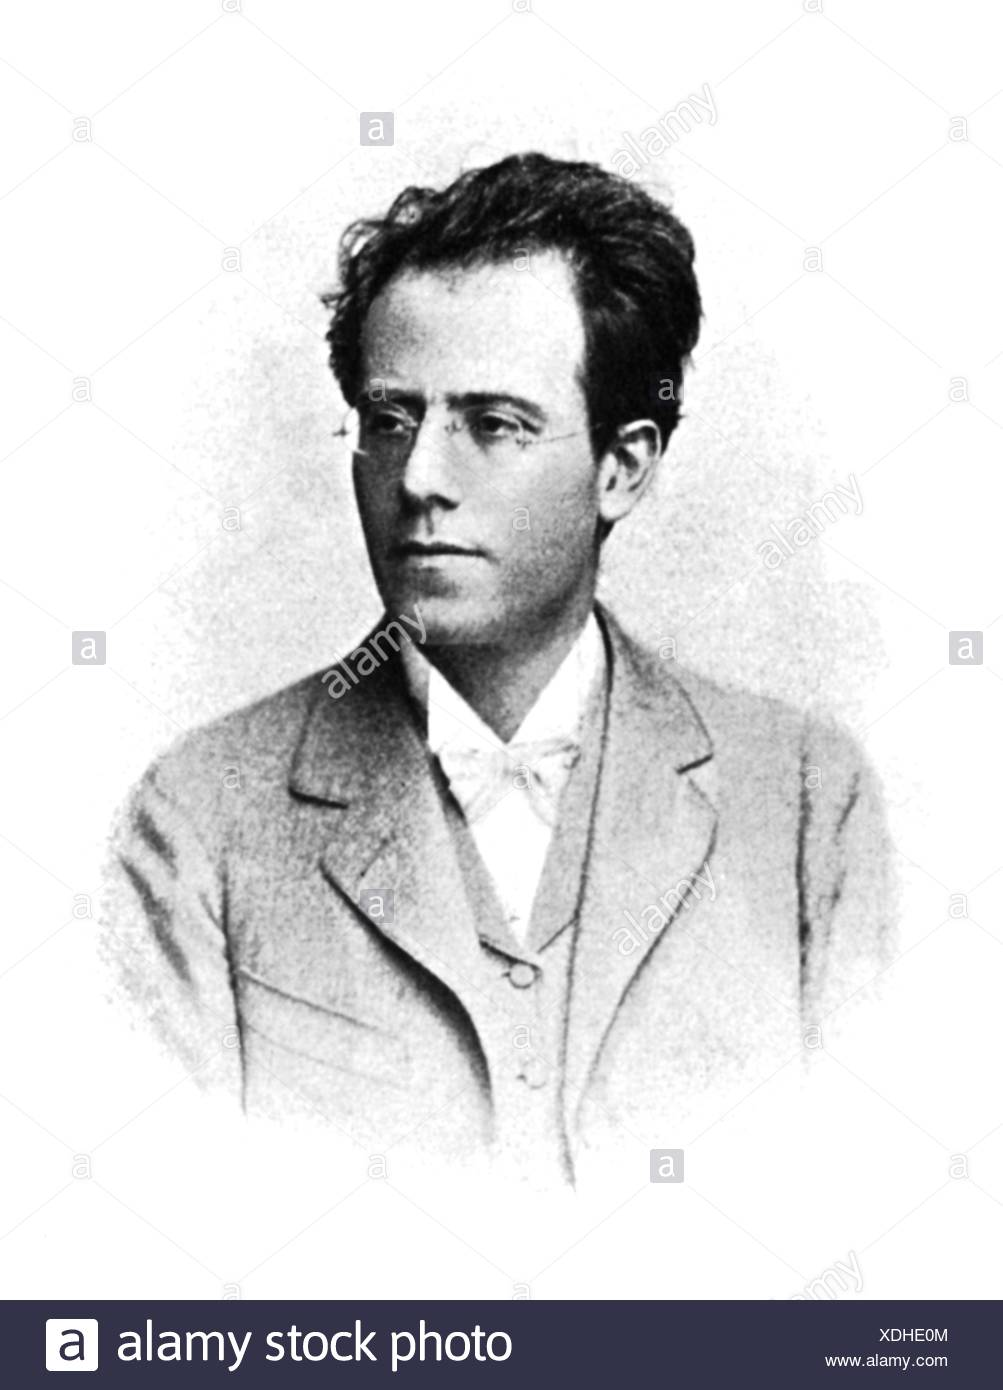 grinder, Gustavus, 7.7.1860 - 18. 5.1911, Austrian composer, conductor, portrait, eyeglasses, bow tie, bow ties, male, man, - Stock Image